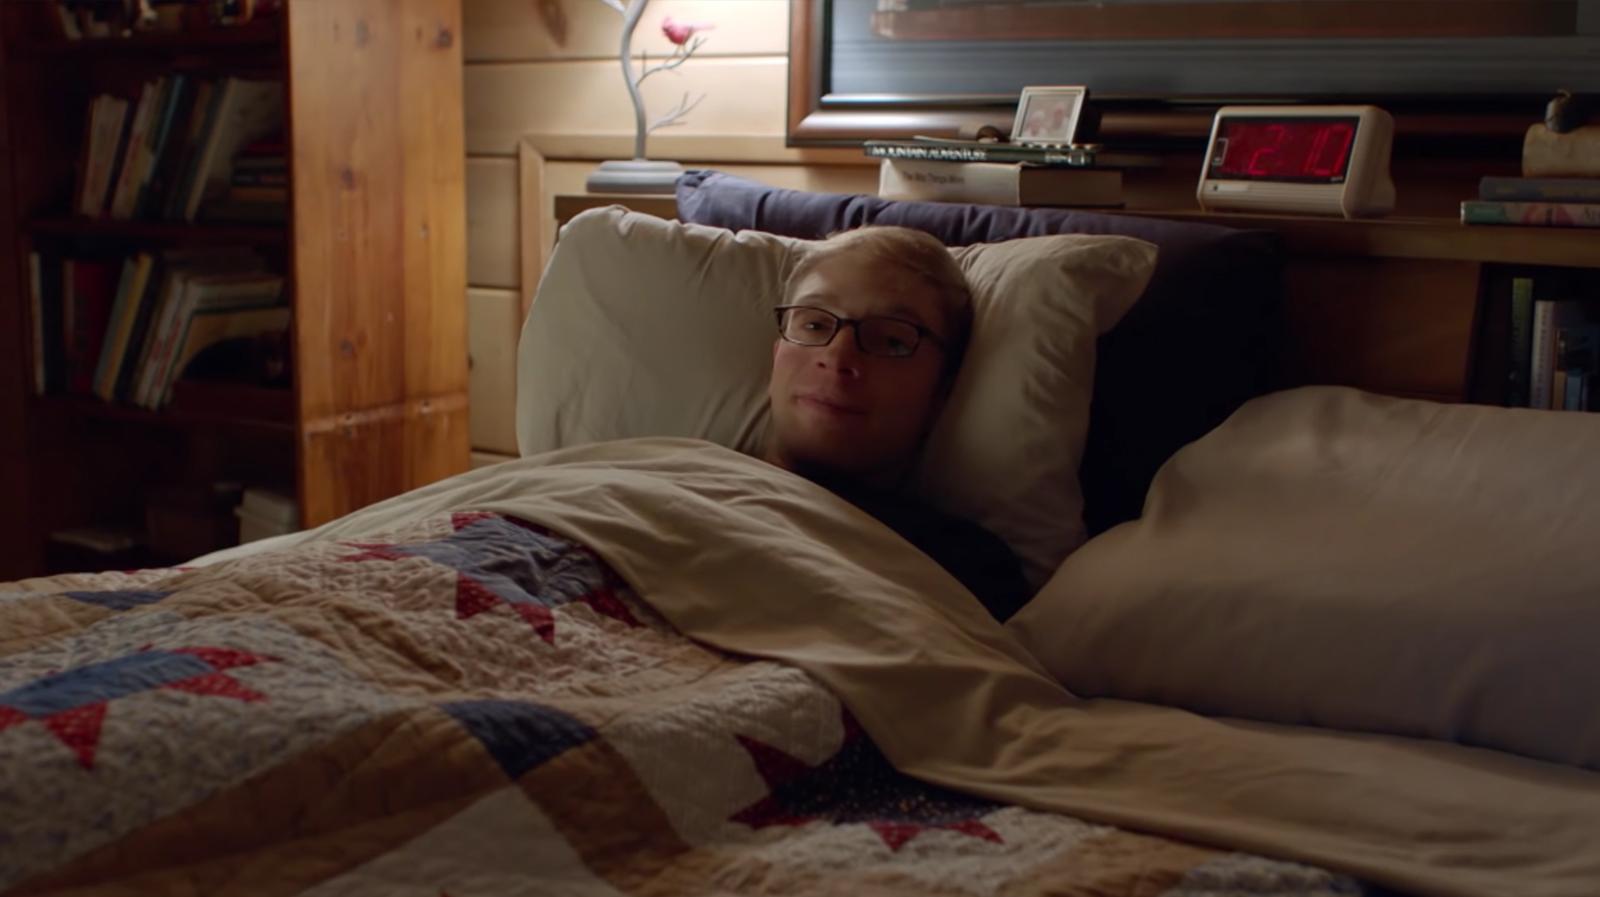 Joe in bed